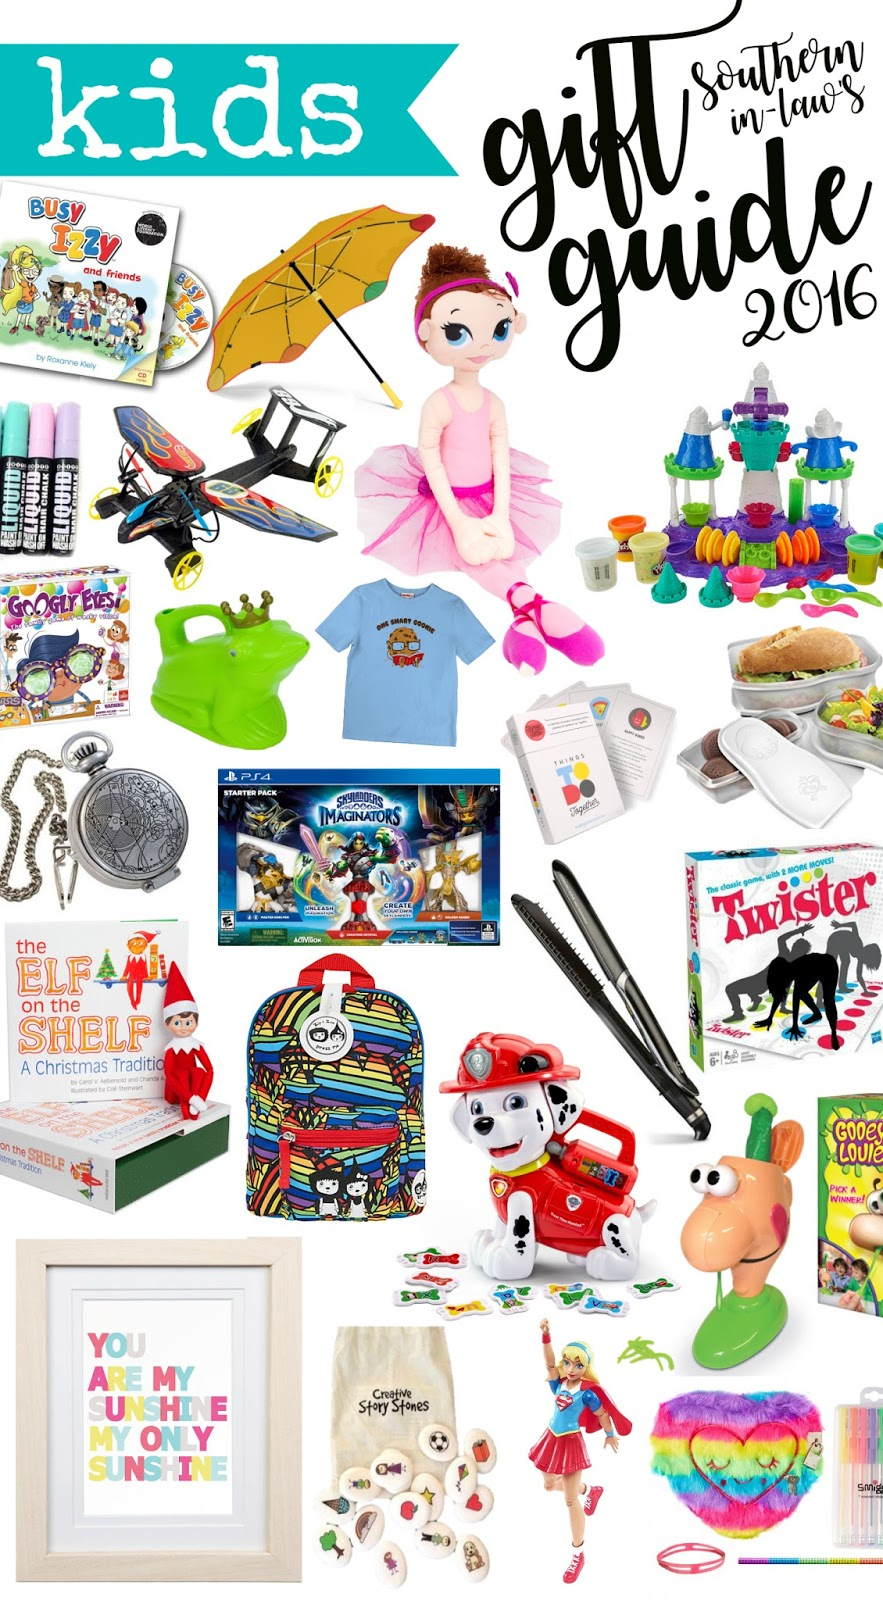 Kids Christmas Present Ideas 2020 Christmas Gift Ideas For Kids For 2020 | Ntscdq